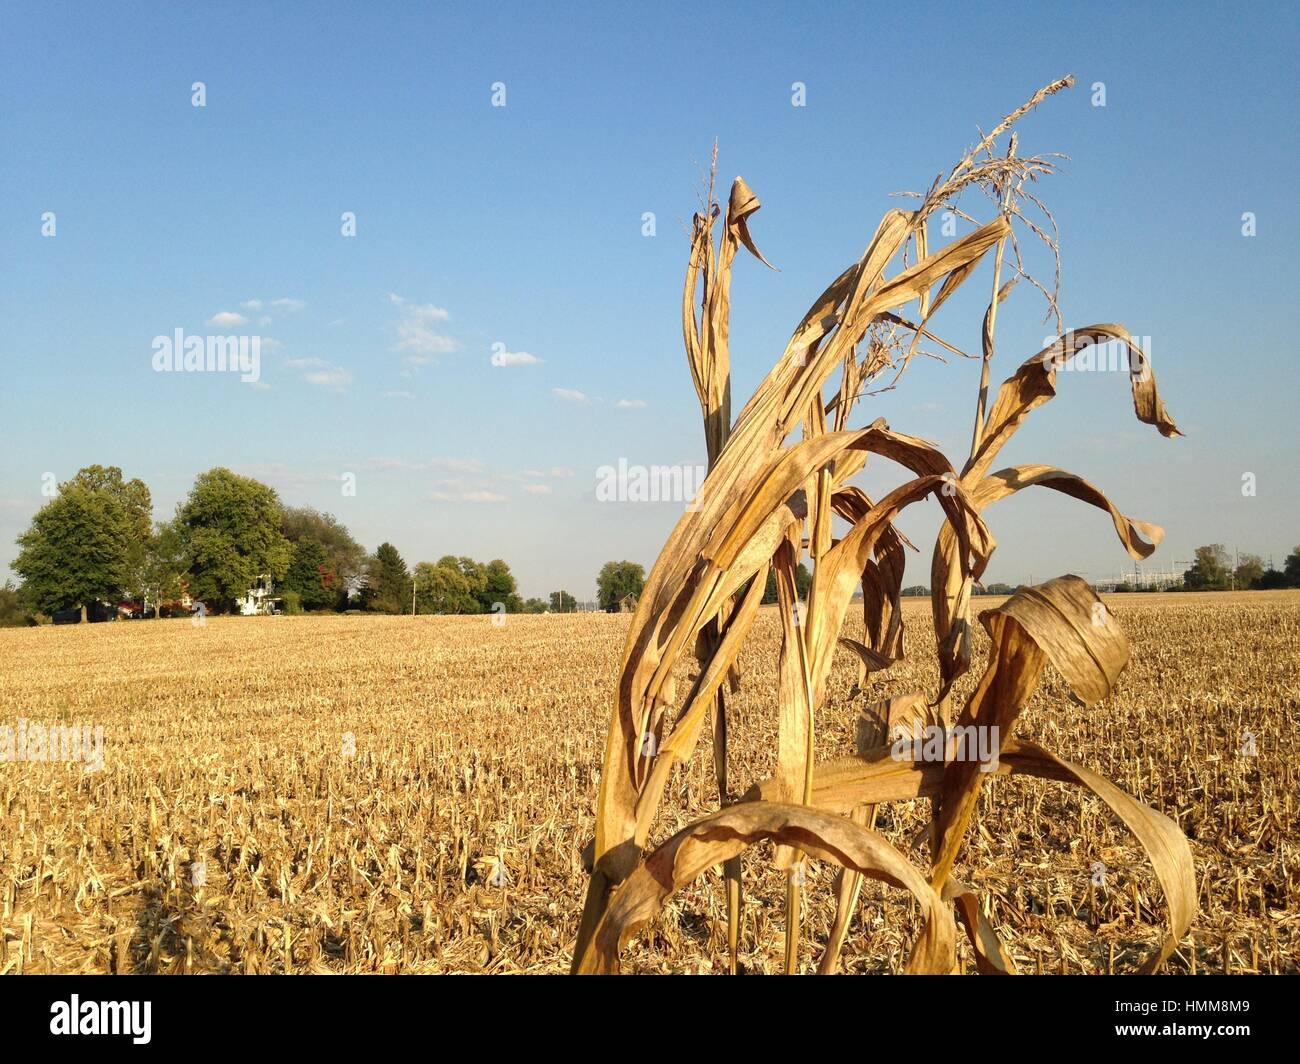 Survivor Corn Stalk In Stubble Field - Stock Image